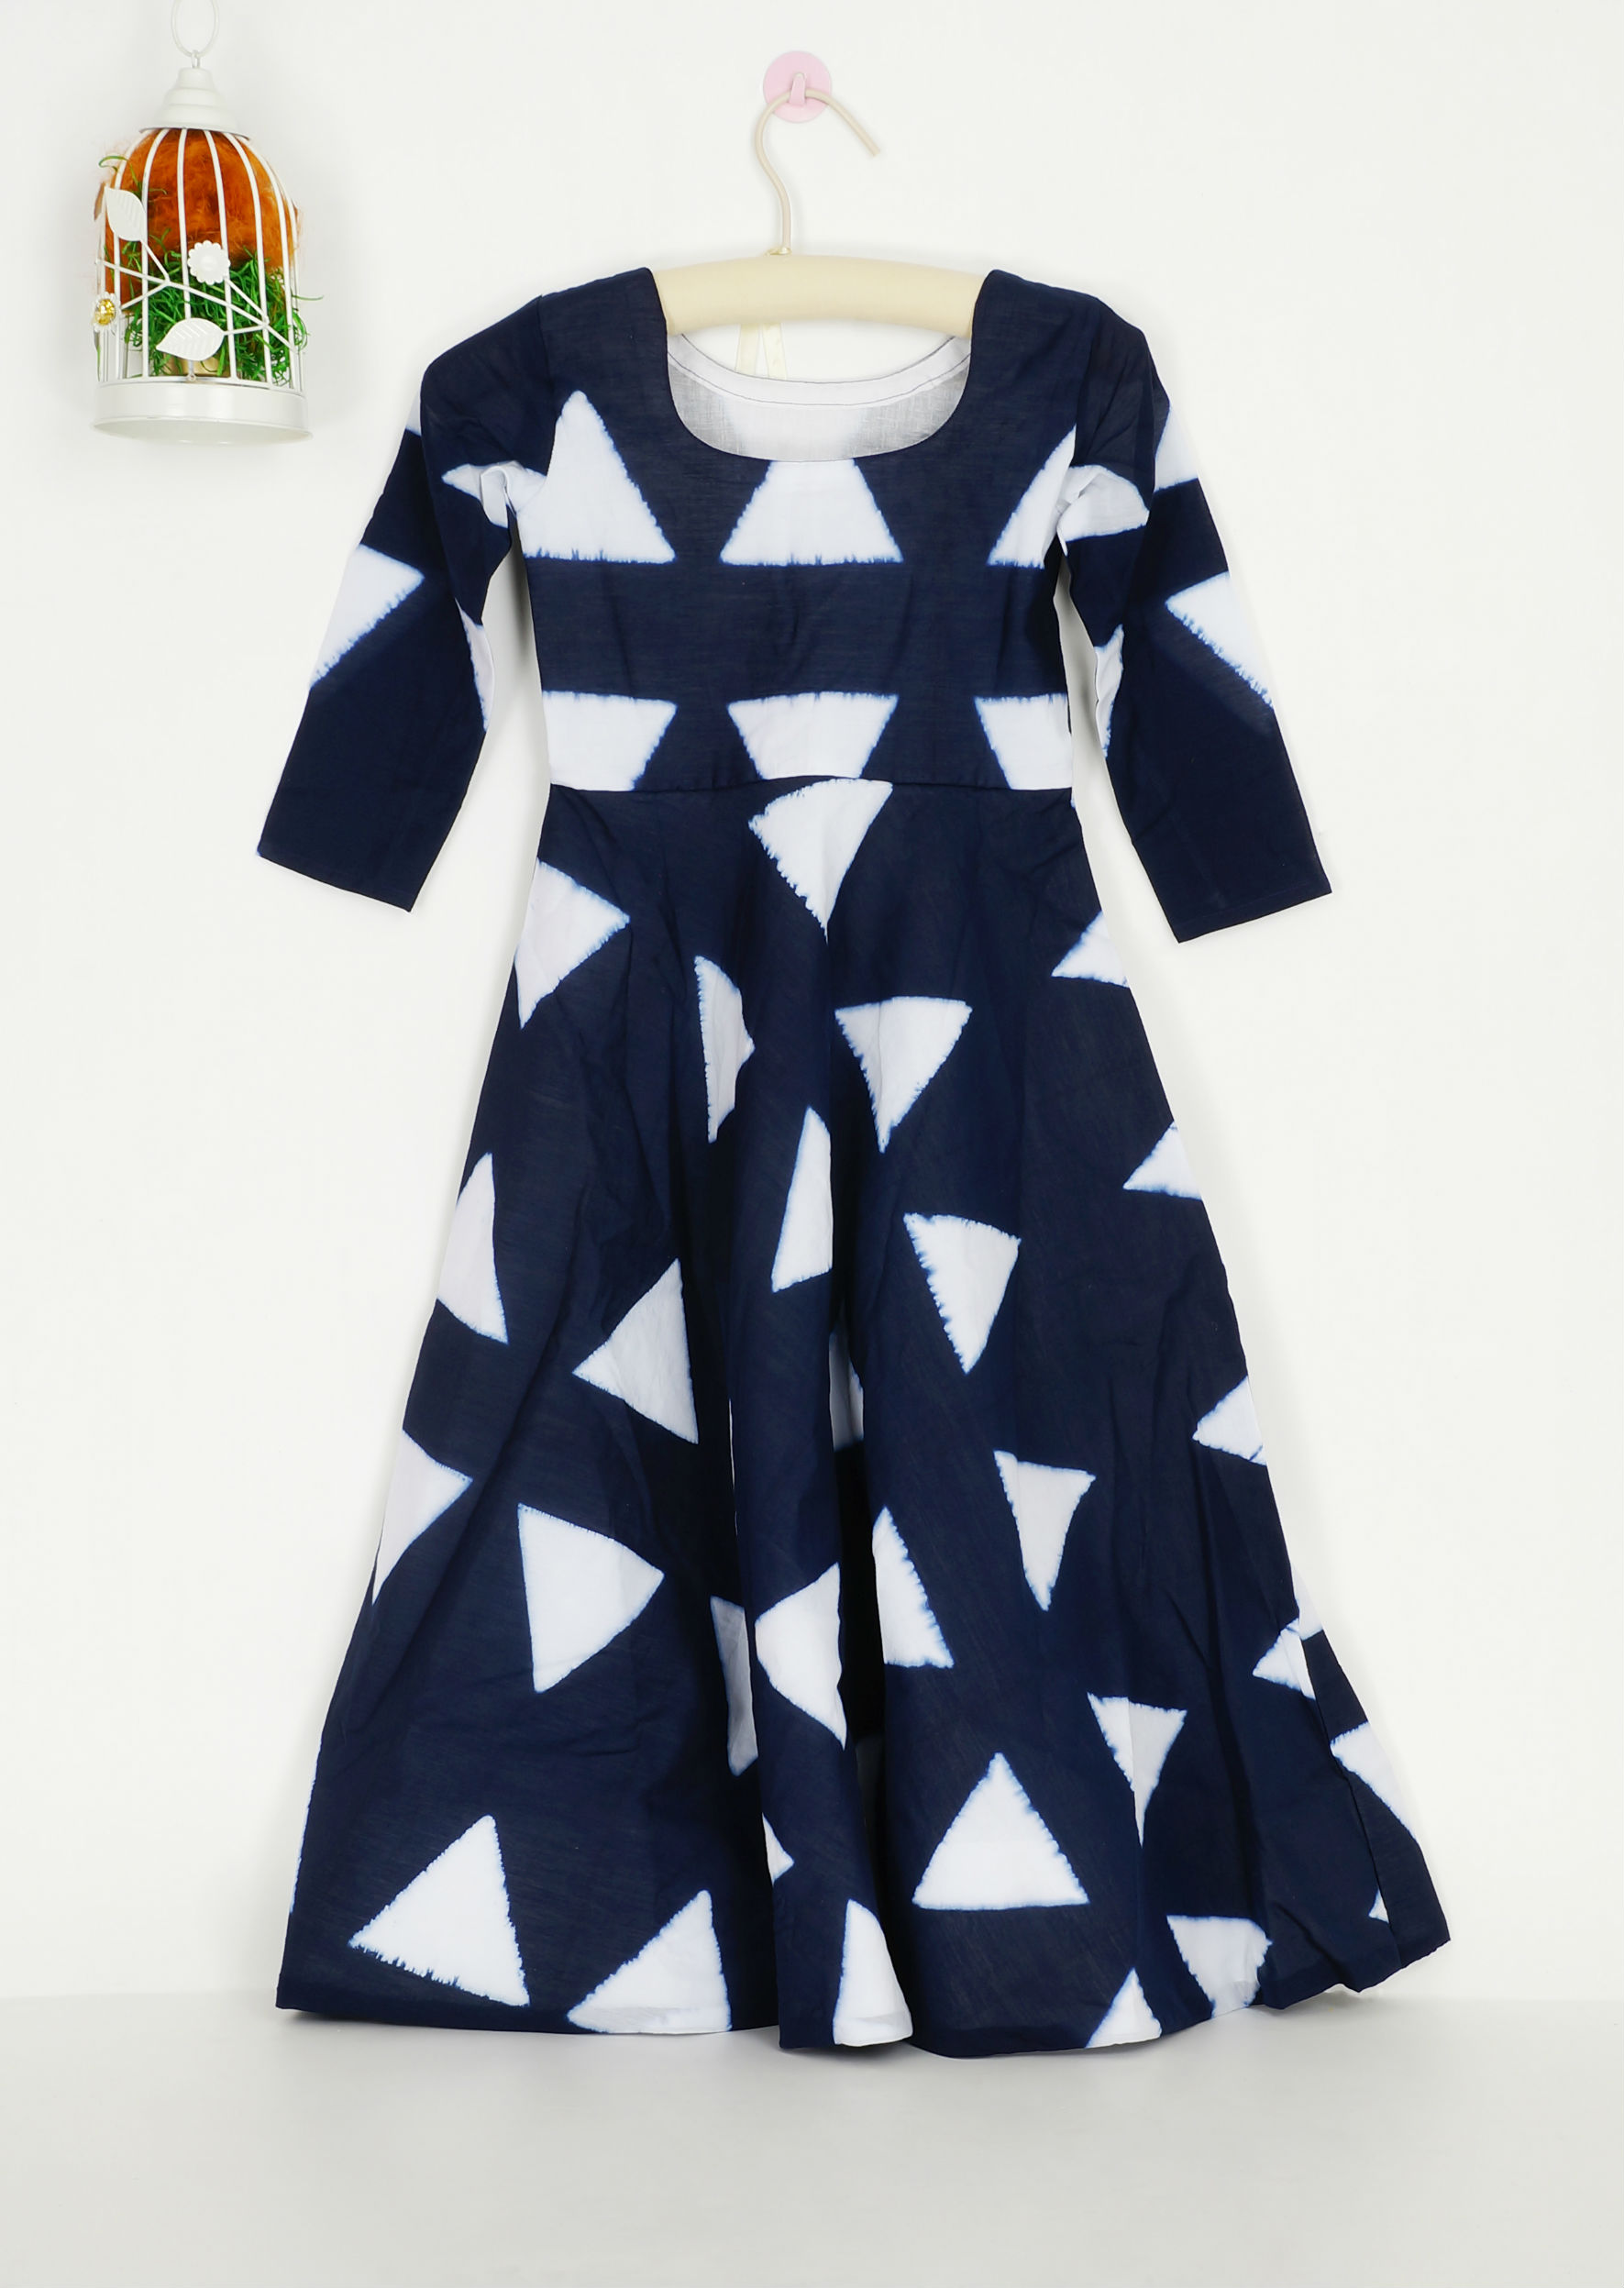 Navy triangle dress